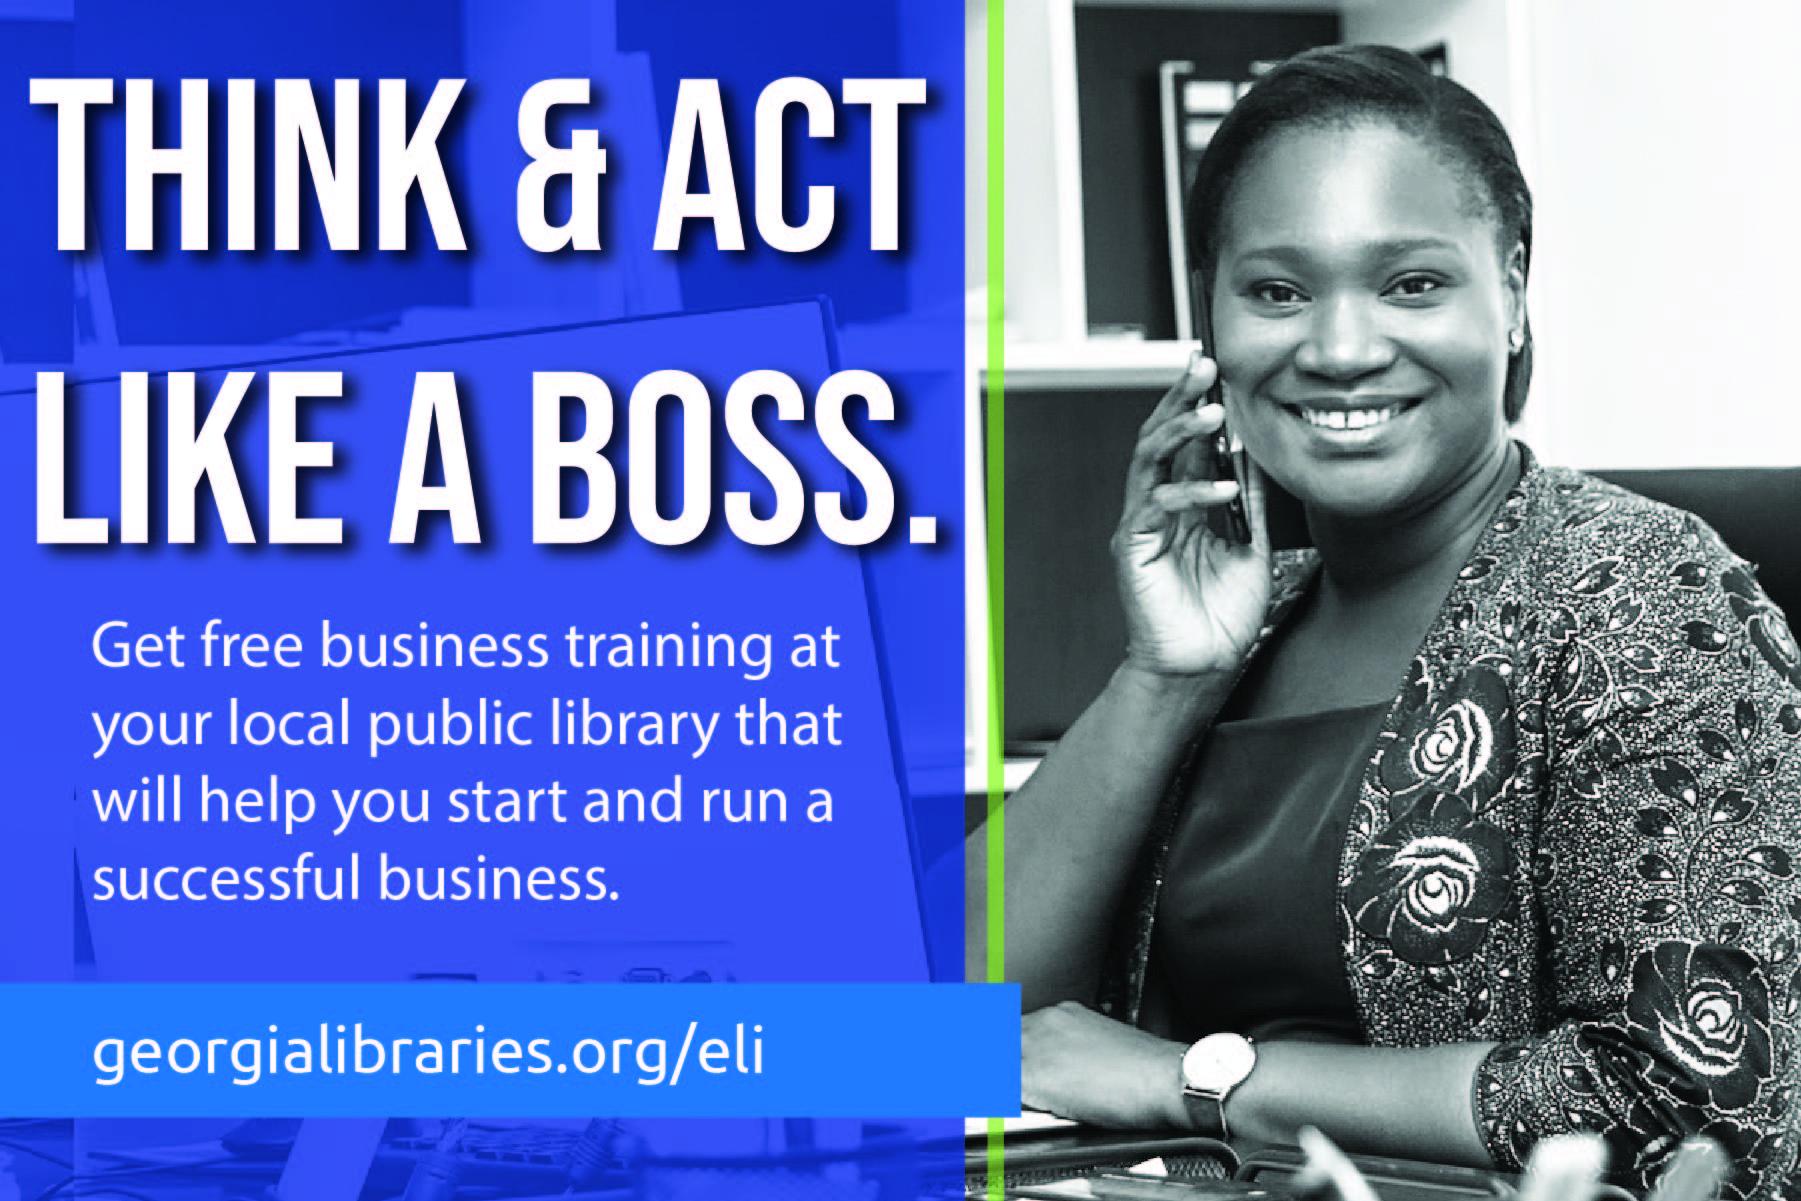 eli postcard graphics_eli black female entrepreneur postcard